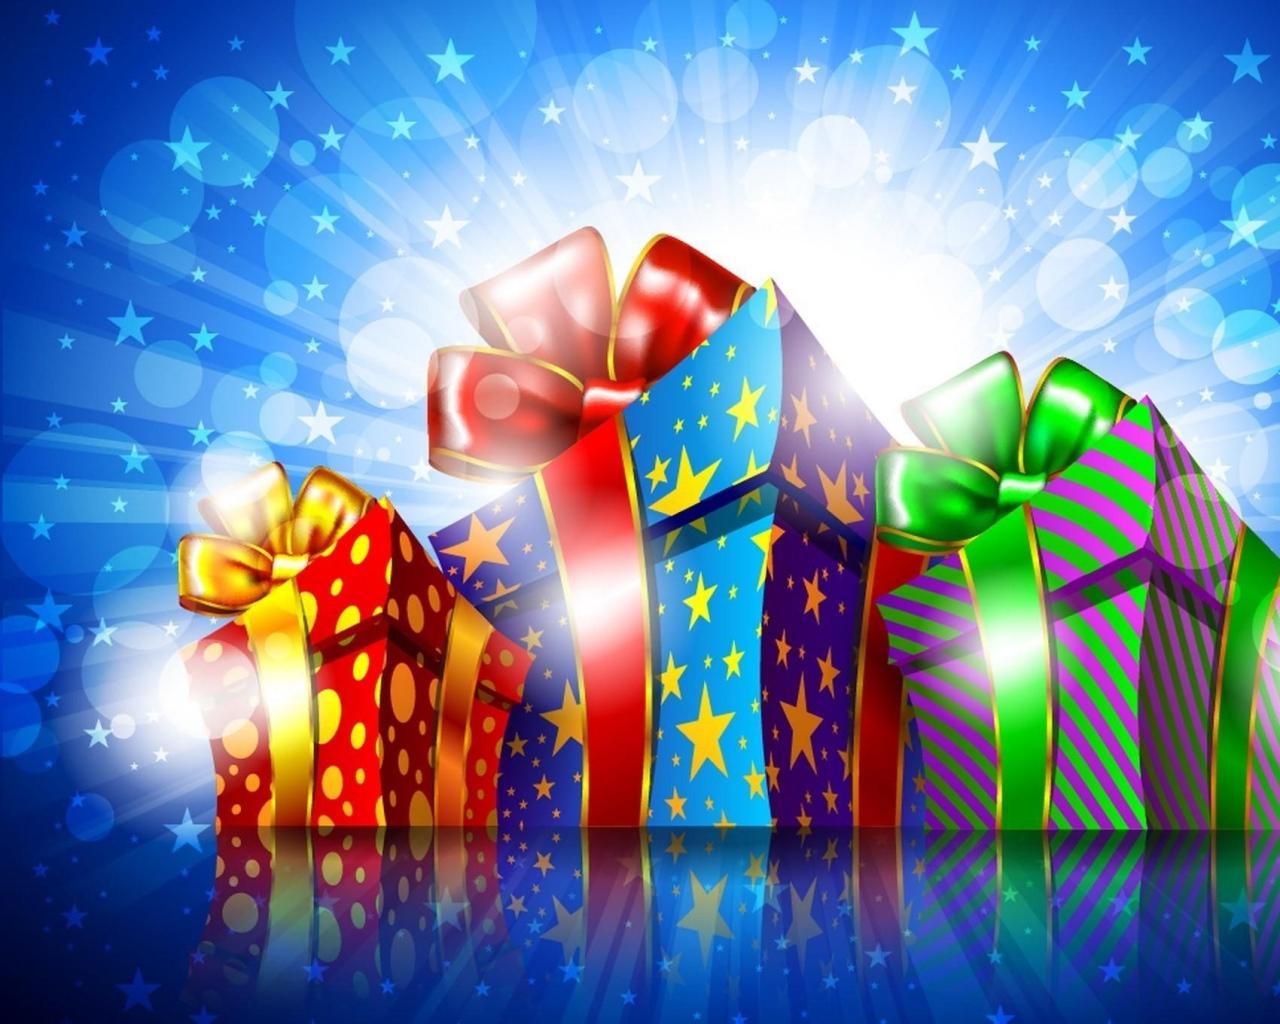 presents_three_packings_bow-knot_stars_light_65004_1280x1024